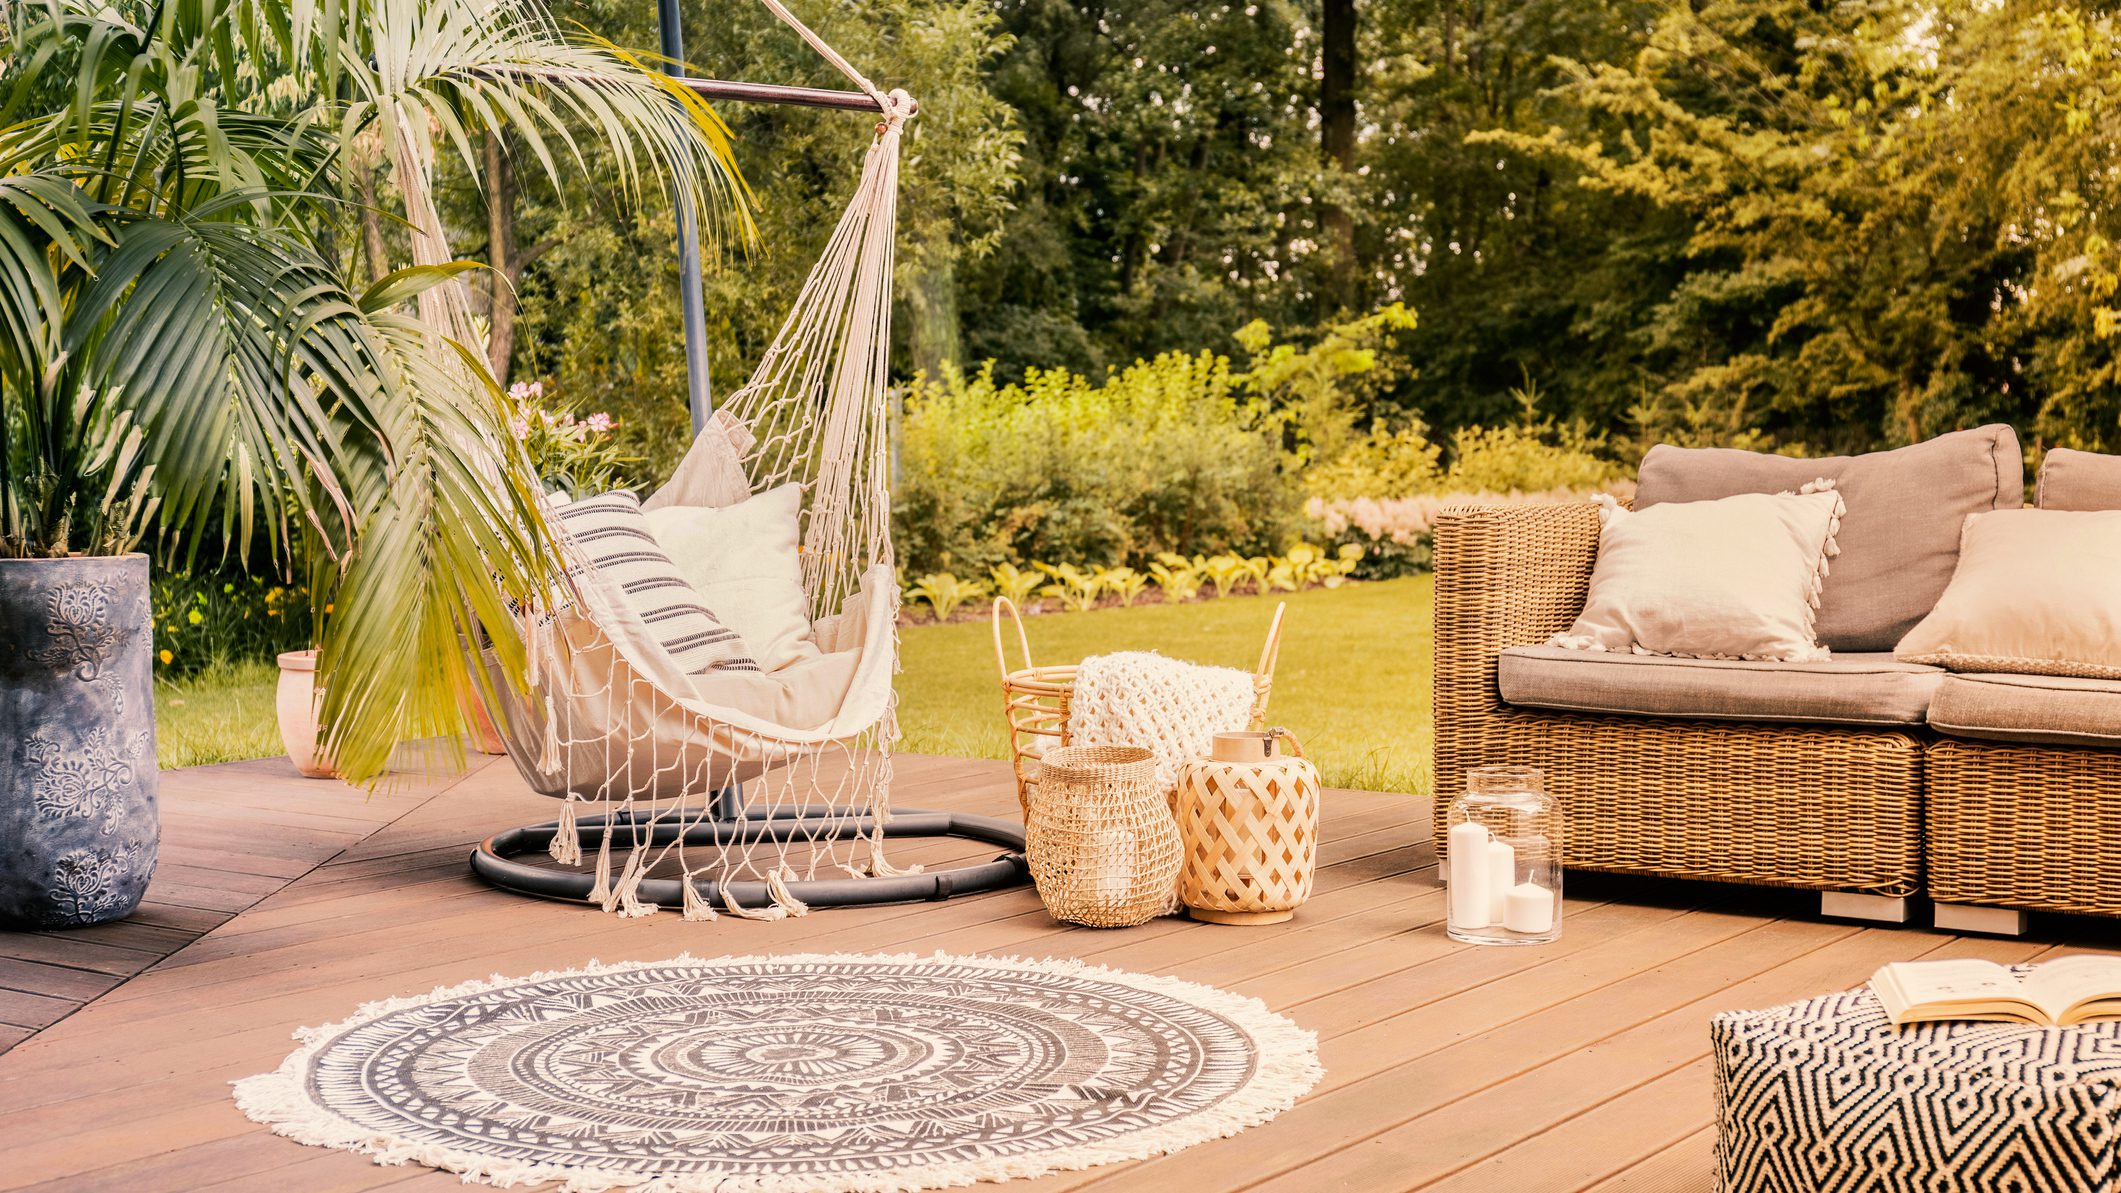 7 easy ways to turn your backyard into paradise during coronavirus